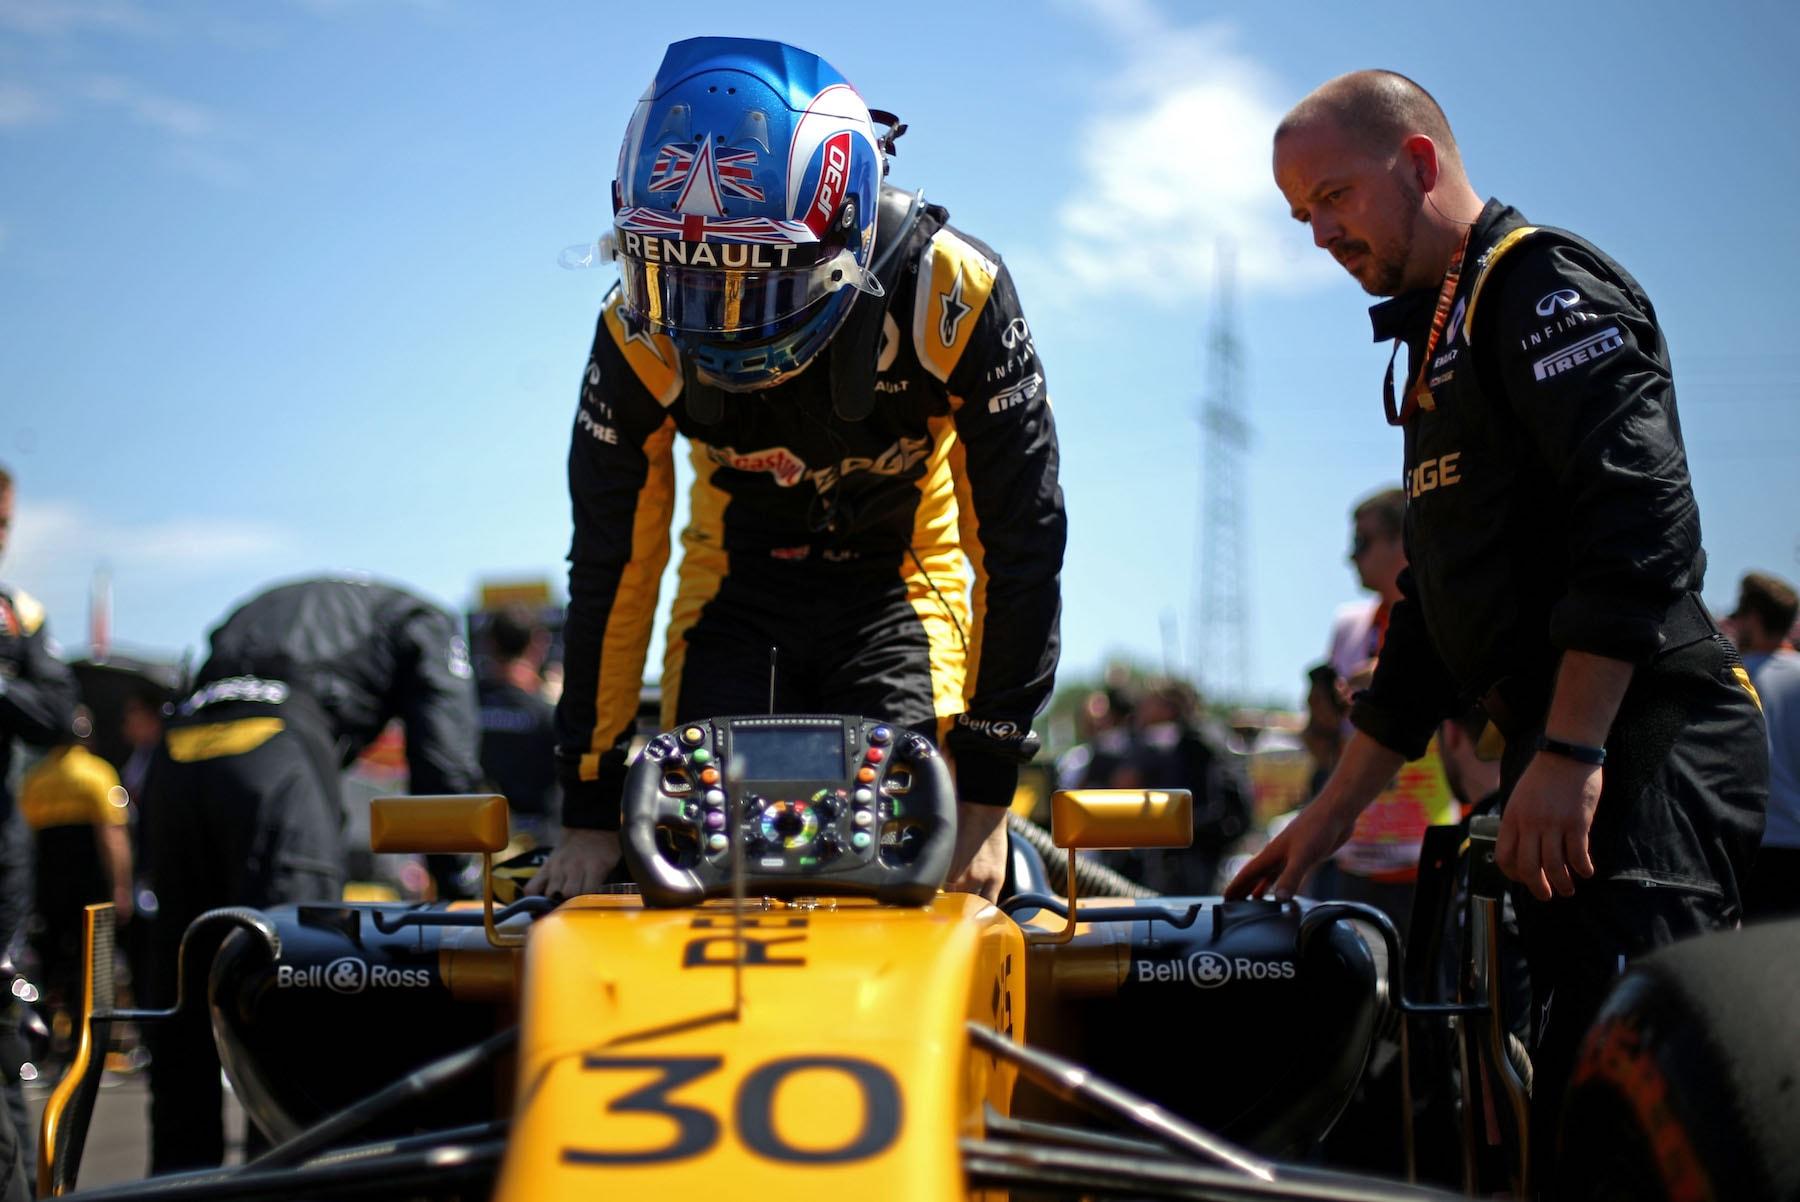 B 2017 Jolyon Palmer | Renault RS17 | 2017 Hungarian GP 1 copy.jpg